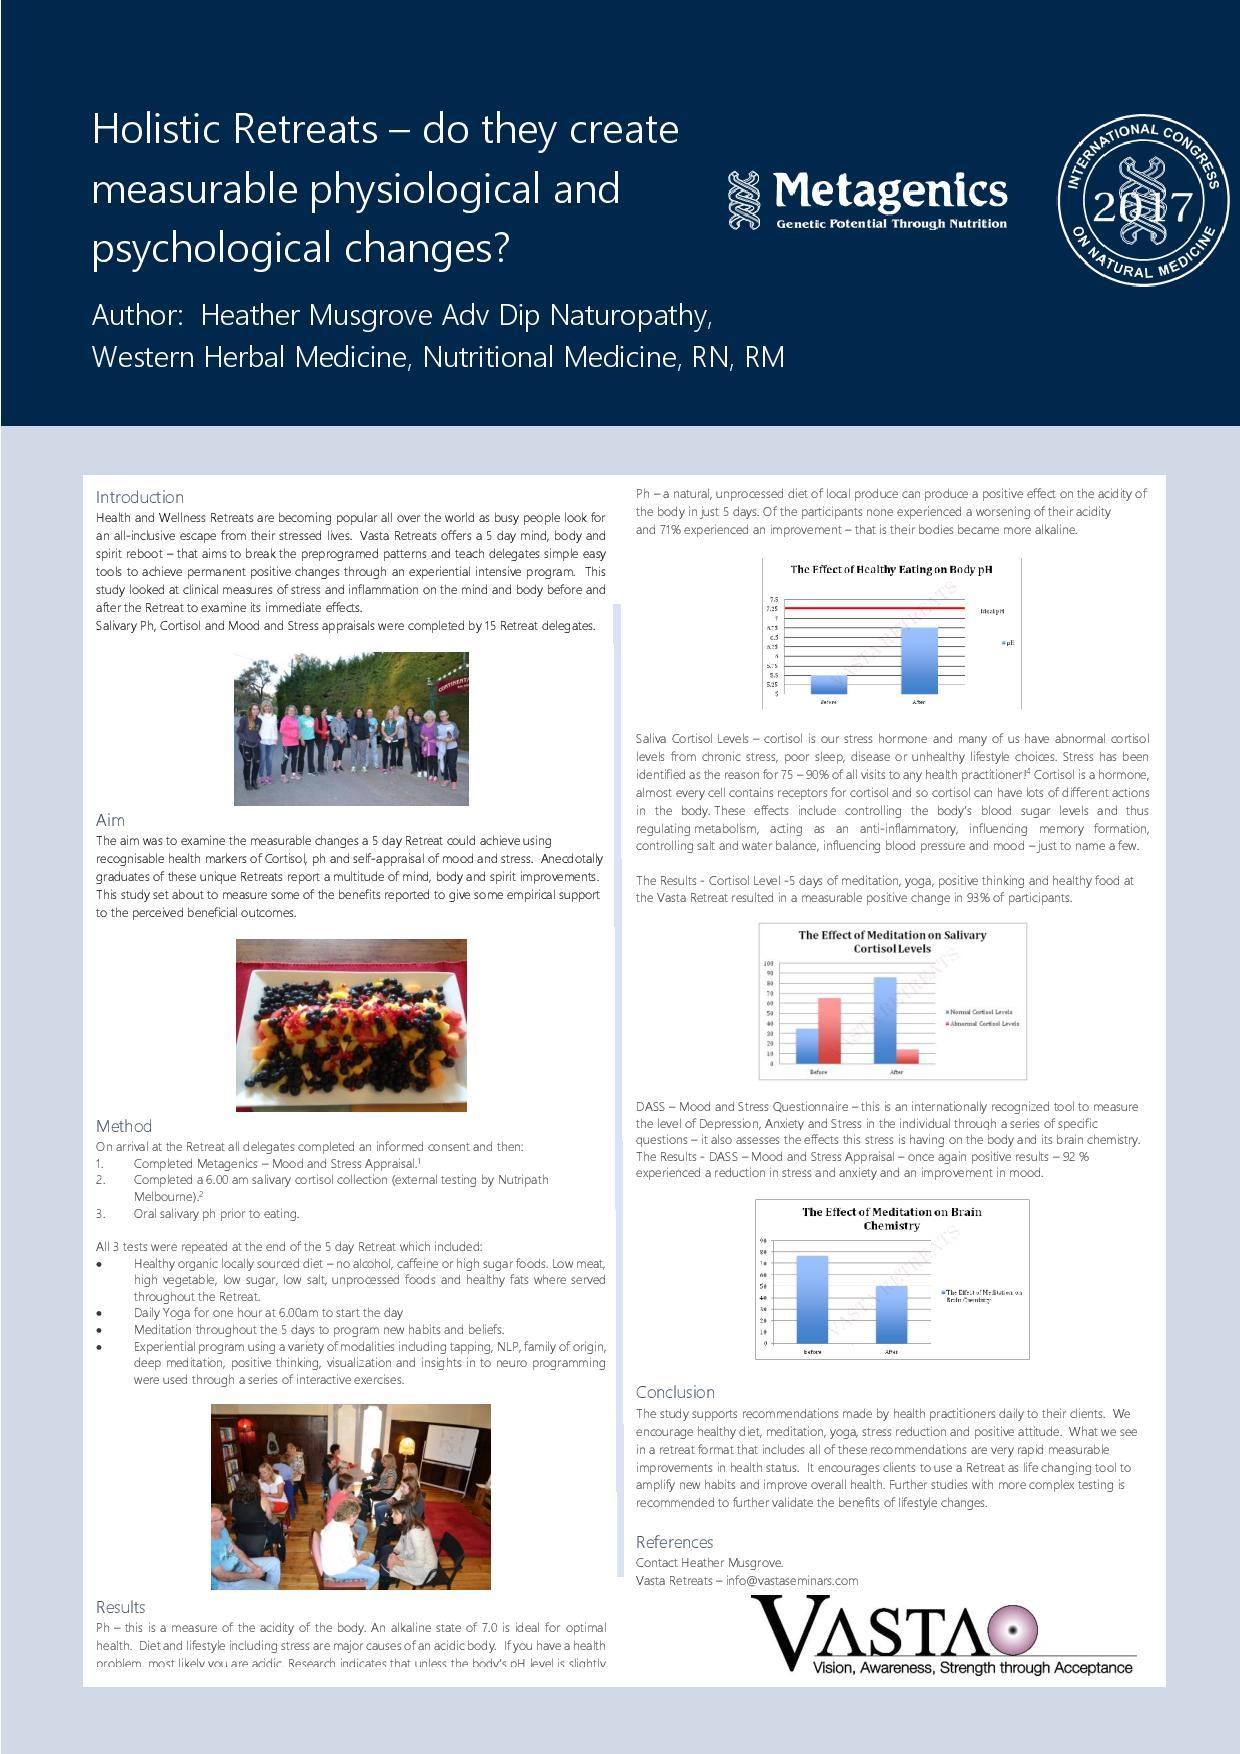 Holistic Retreats - evidence of benefit